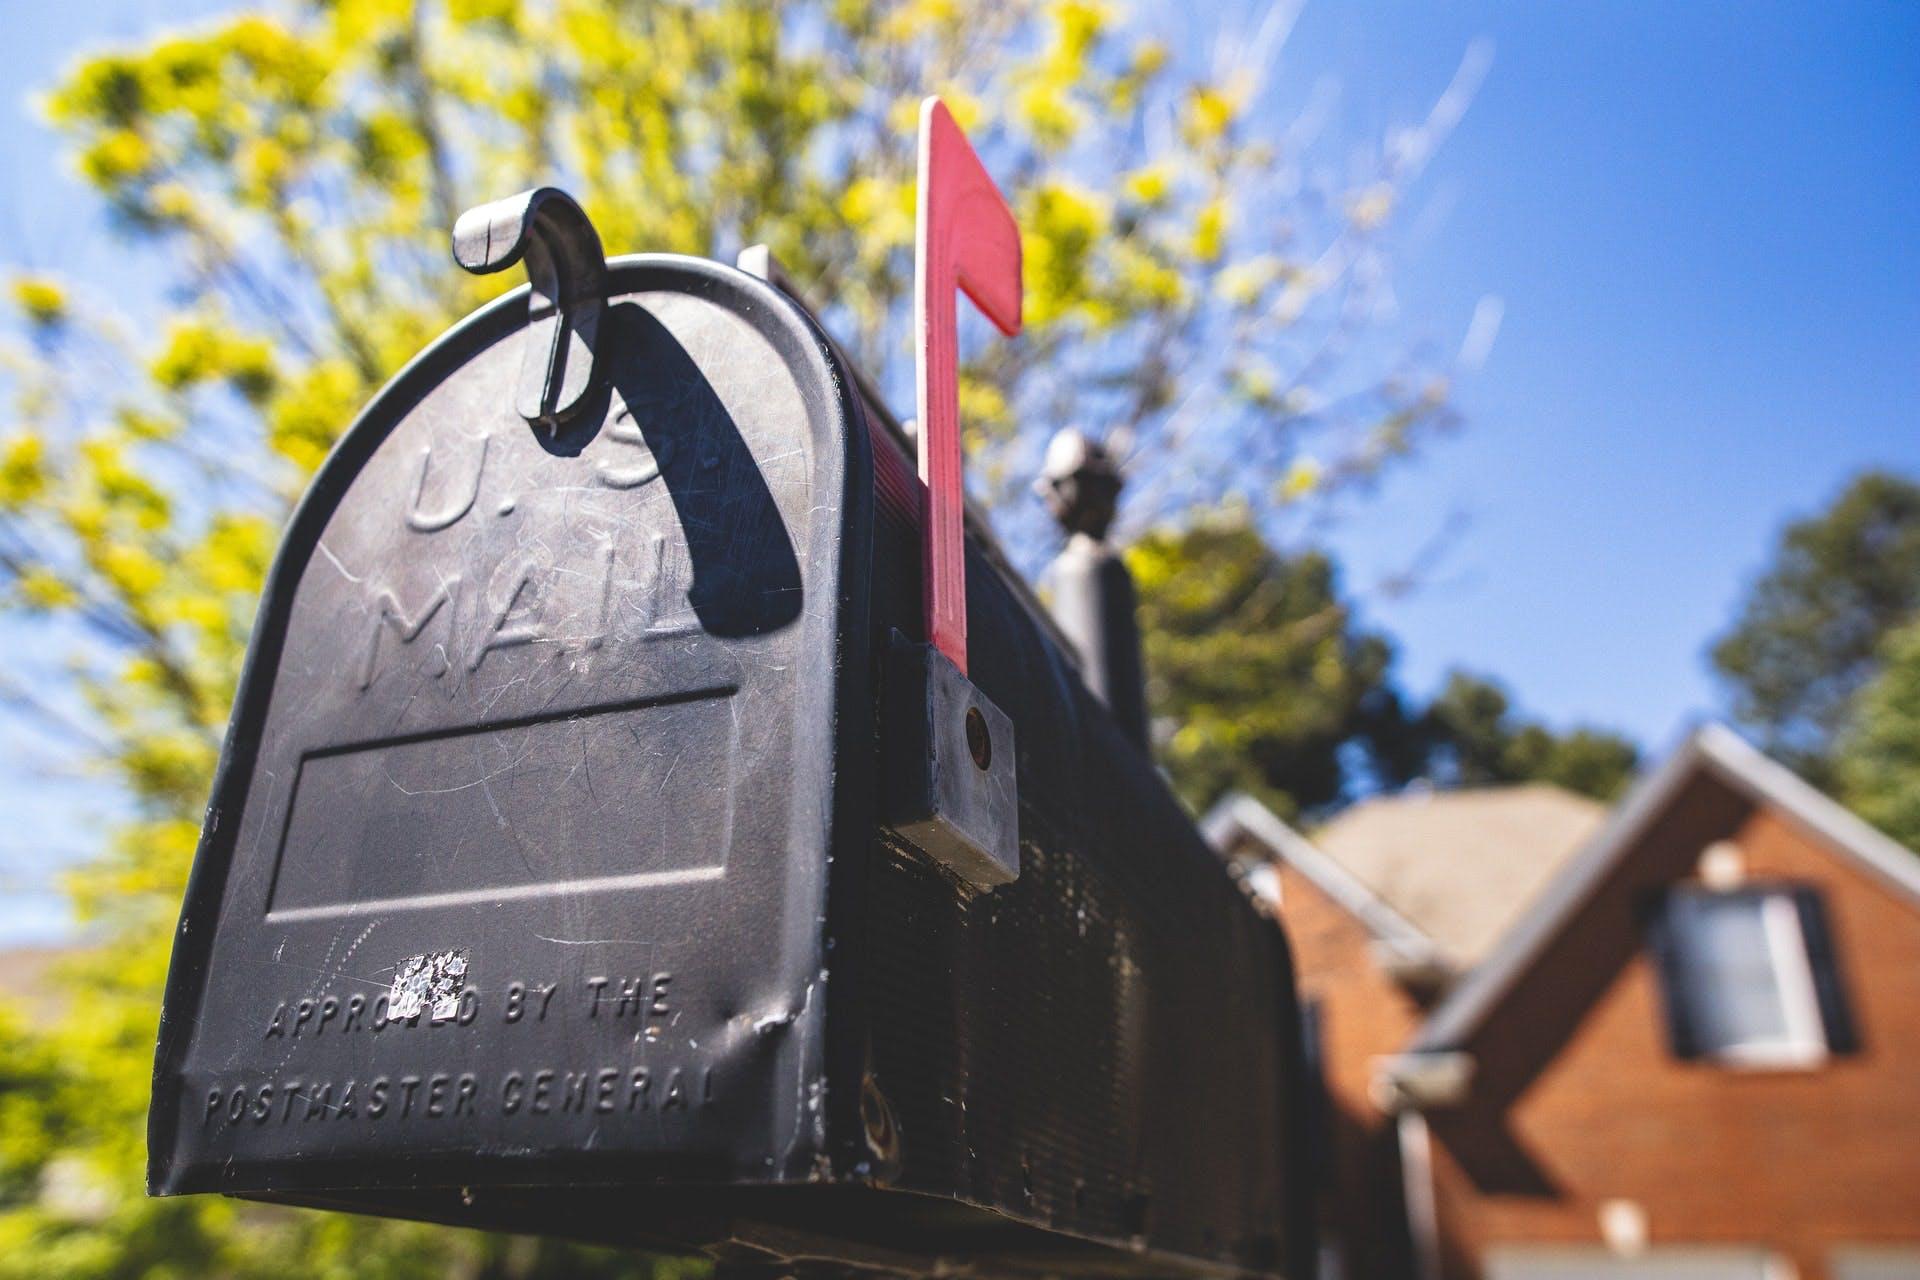 What's a Mailbox Alarm?